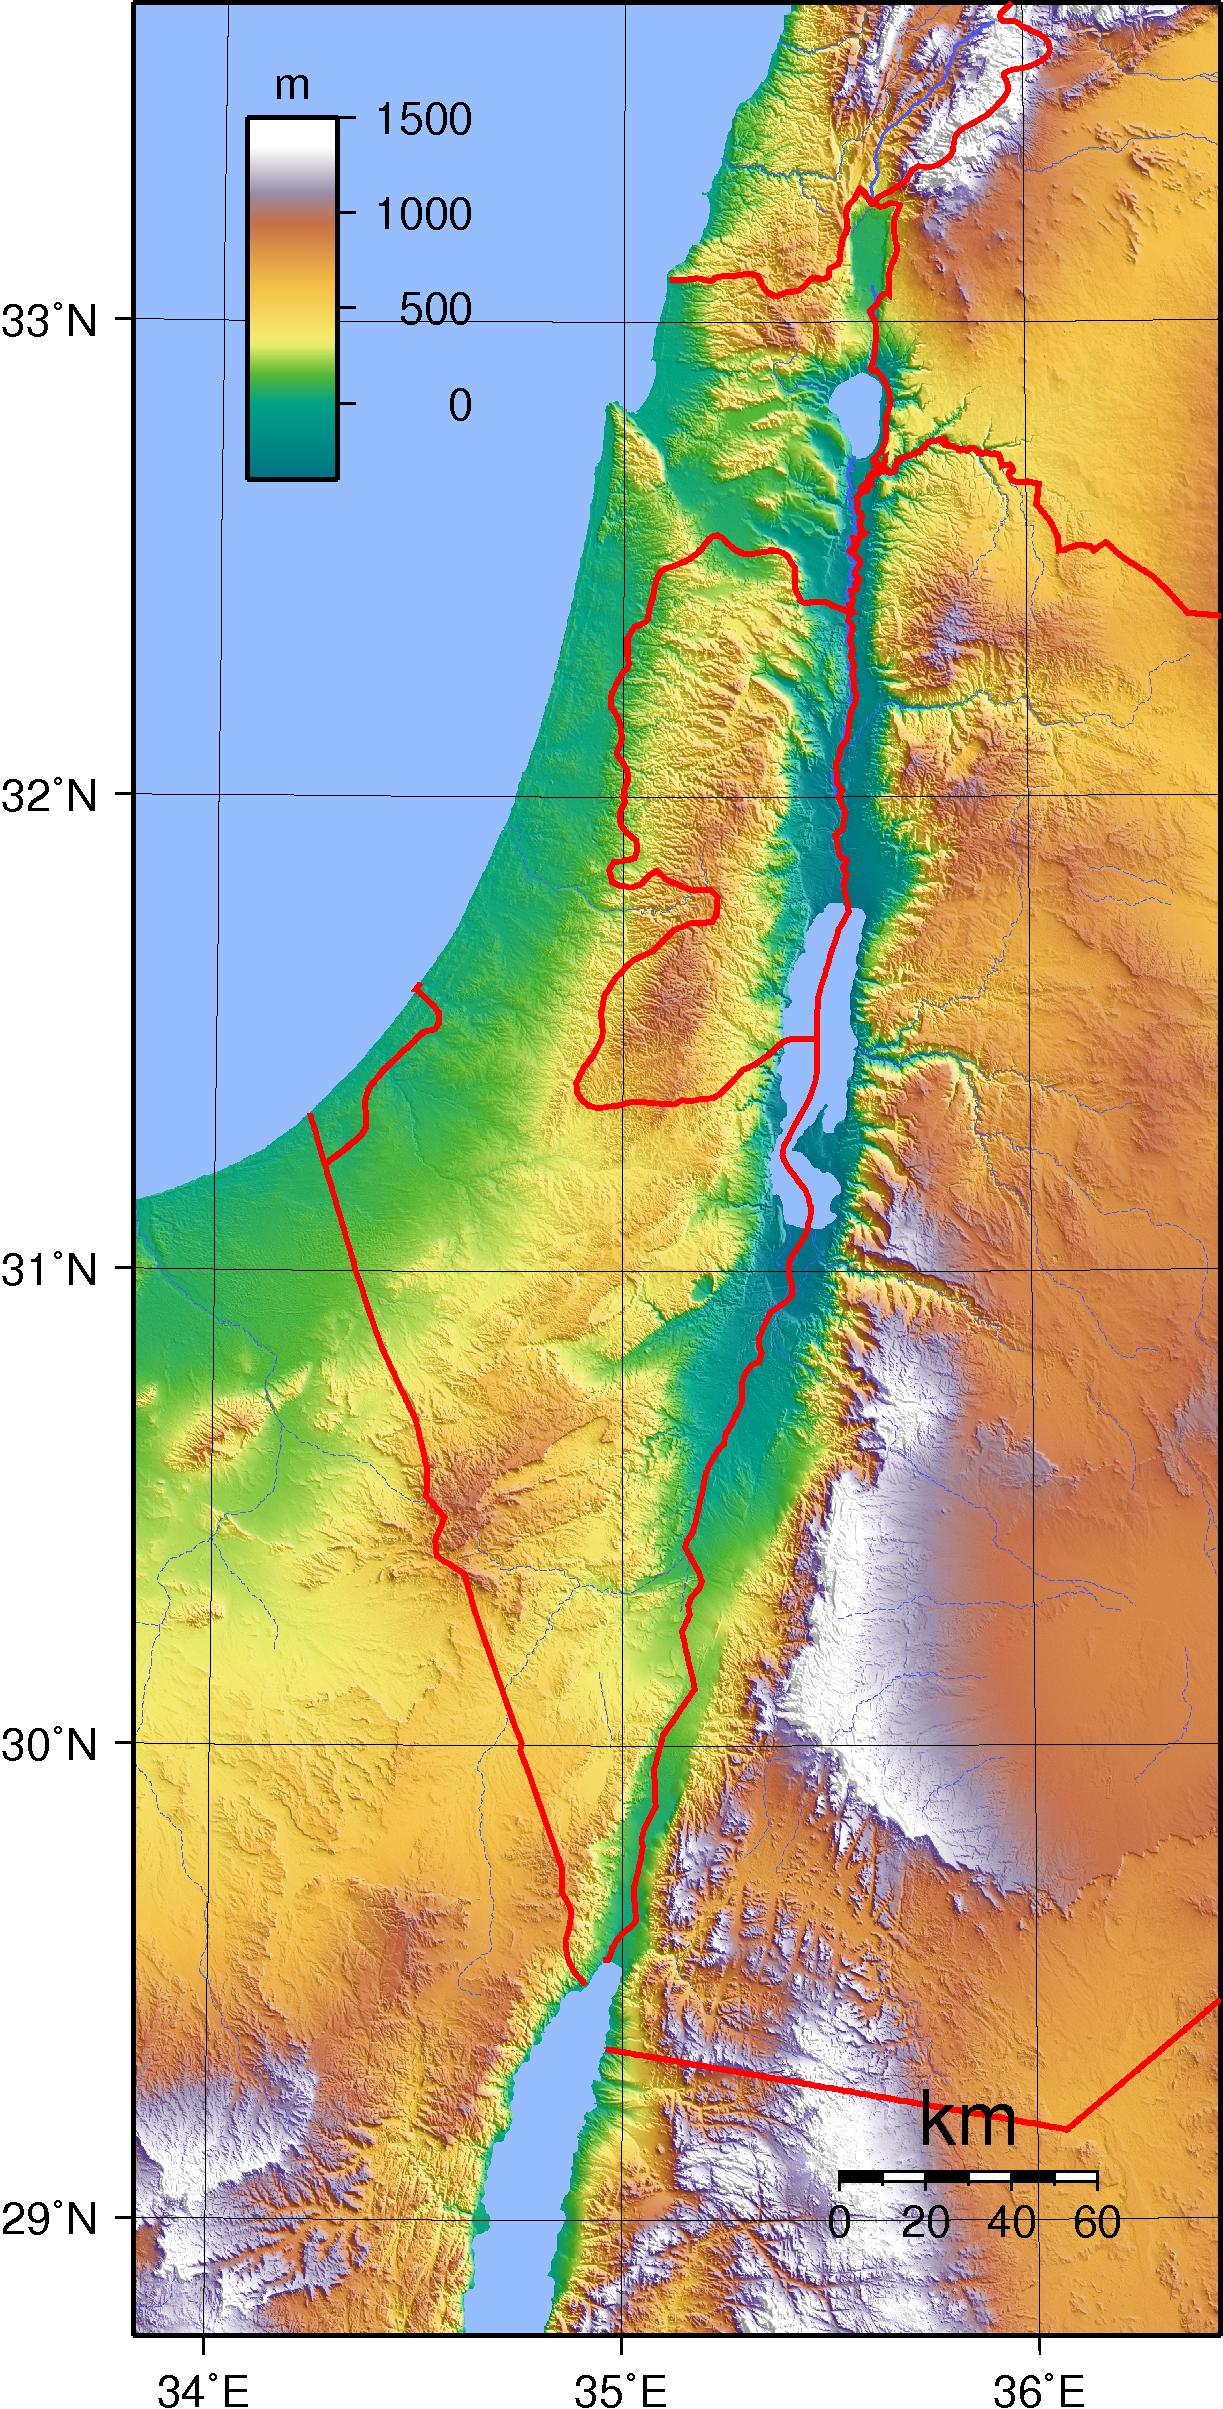 Pin By Adrianne Bonham On Israel In 2019 Topography Map Israel